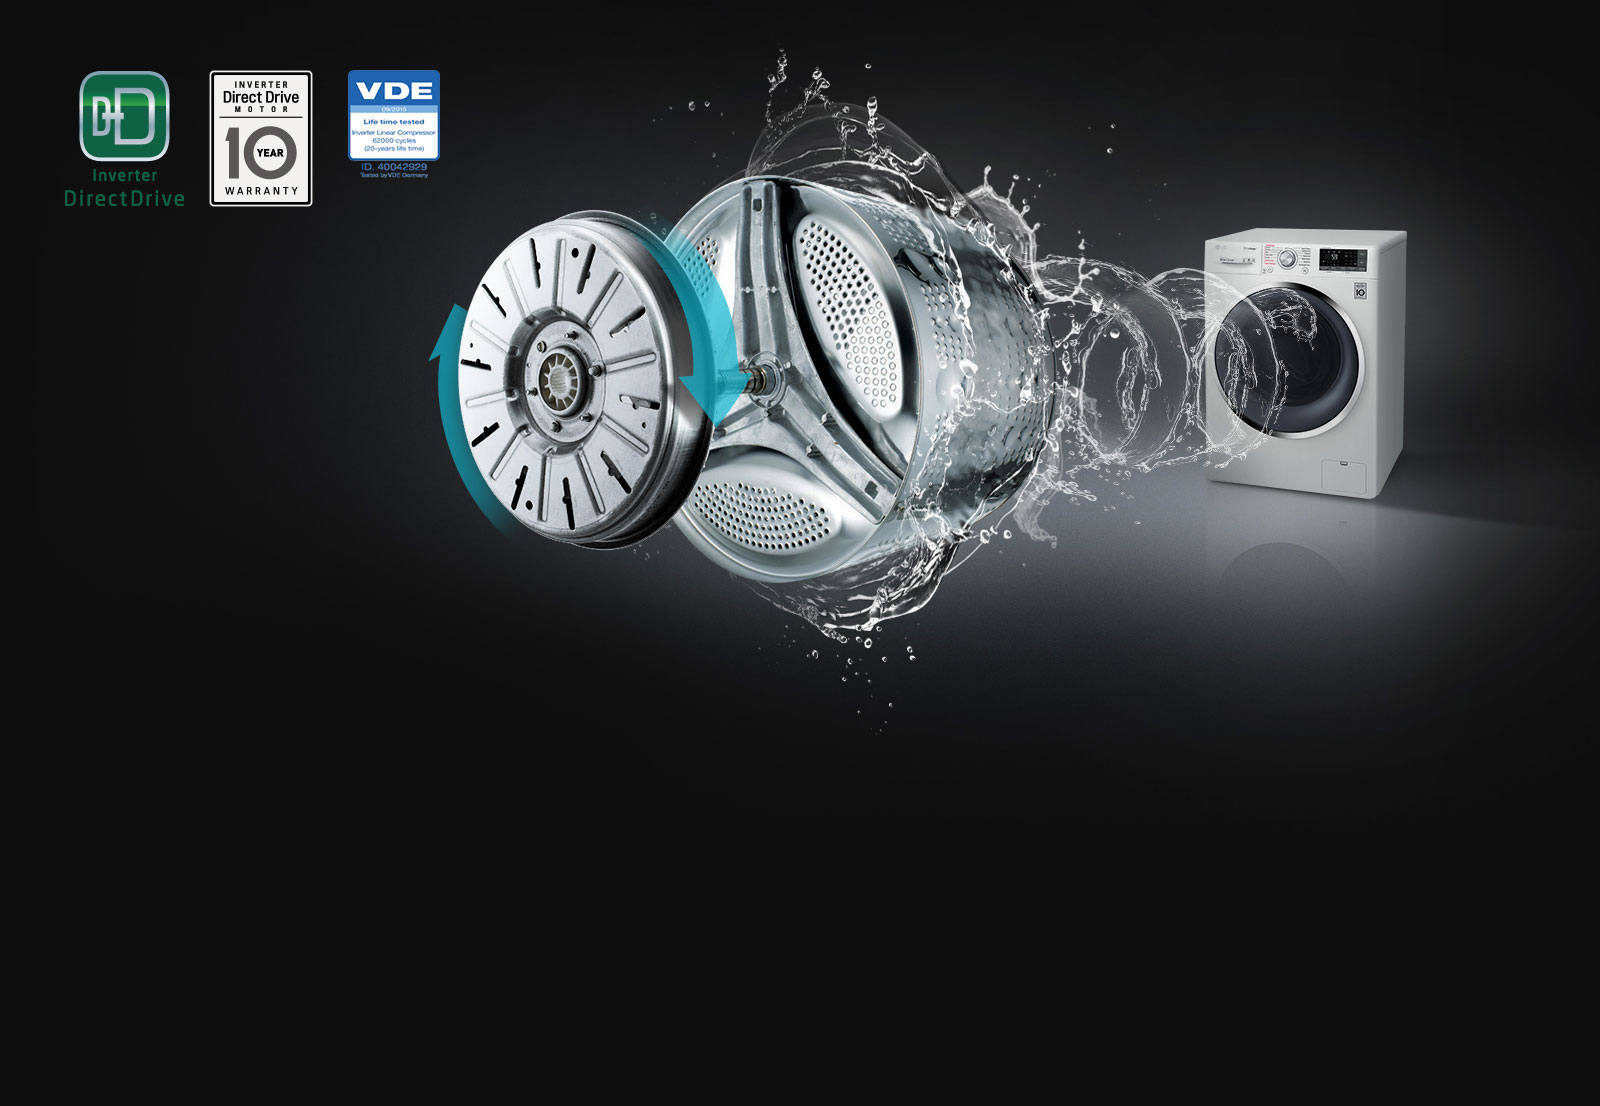 LG FHT1408ZWL 6.5 kg Invertor Technology